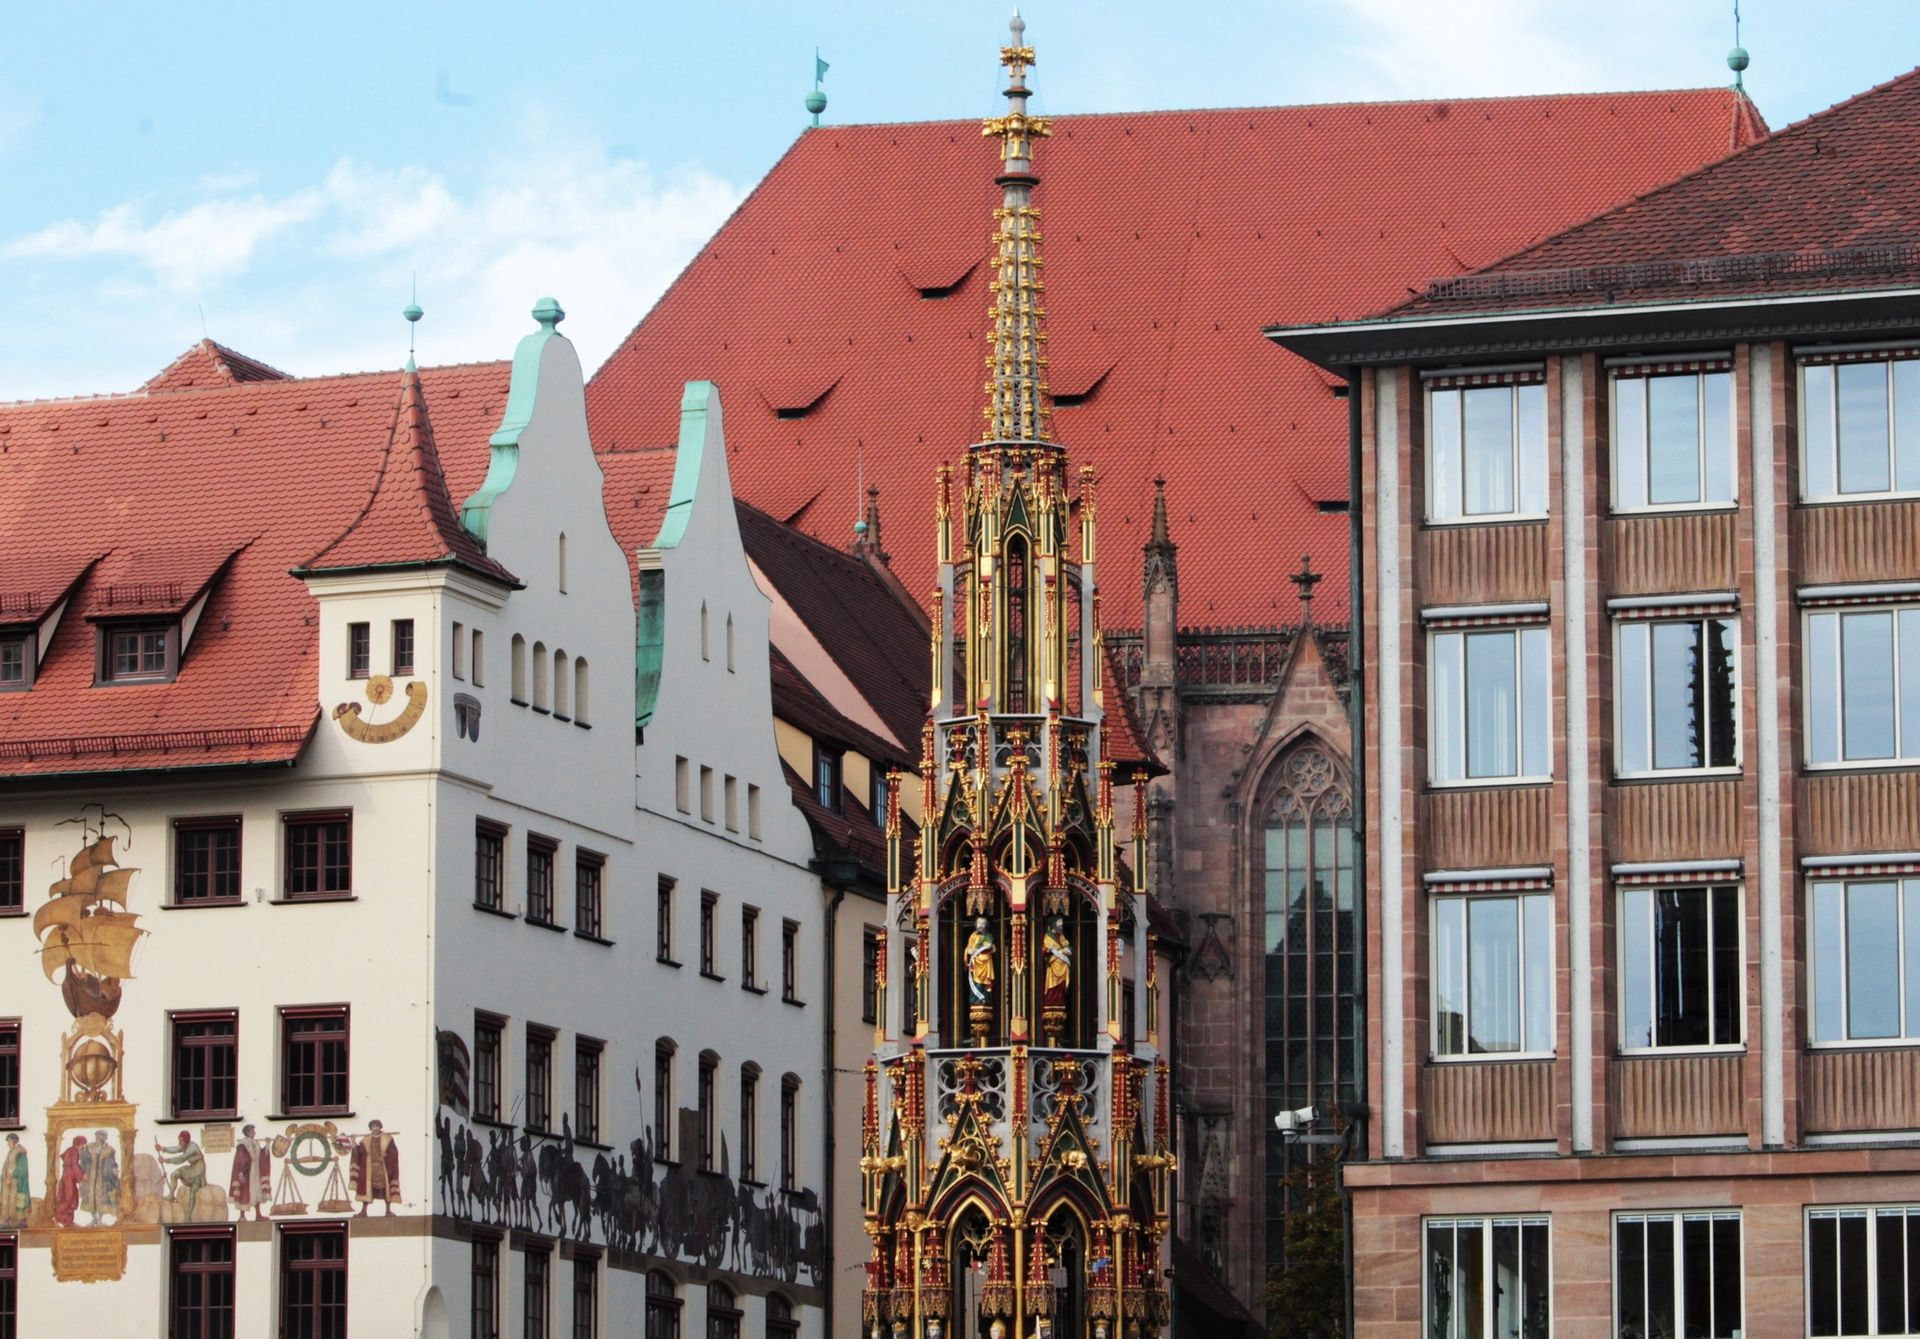 Anticimex Kammerjäger in Nürnberg